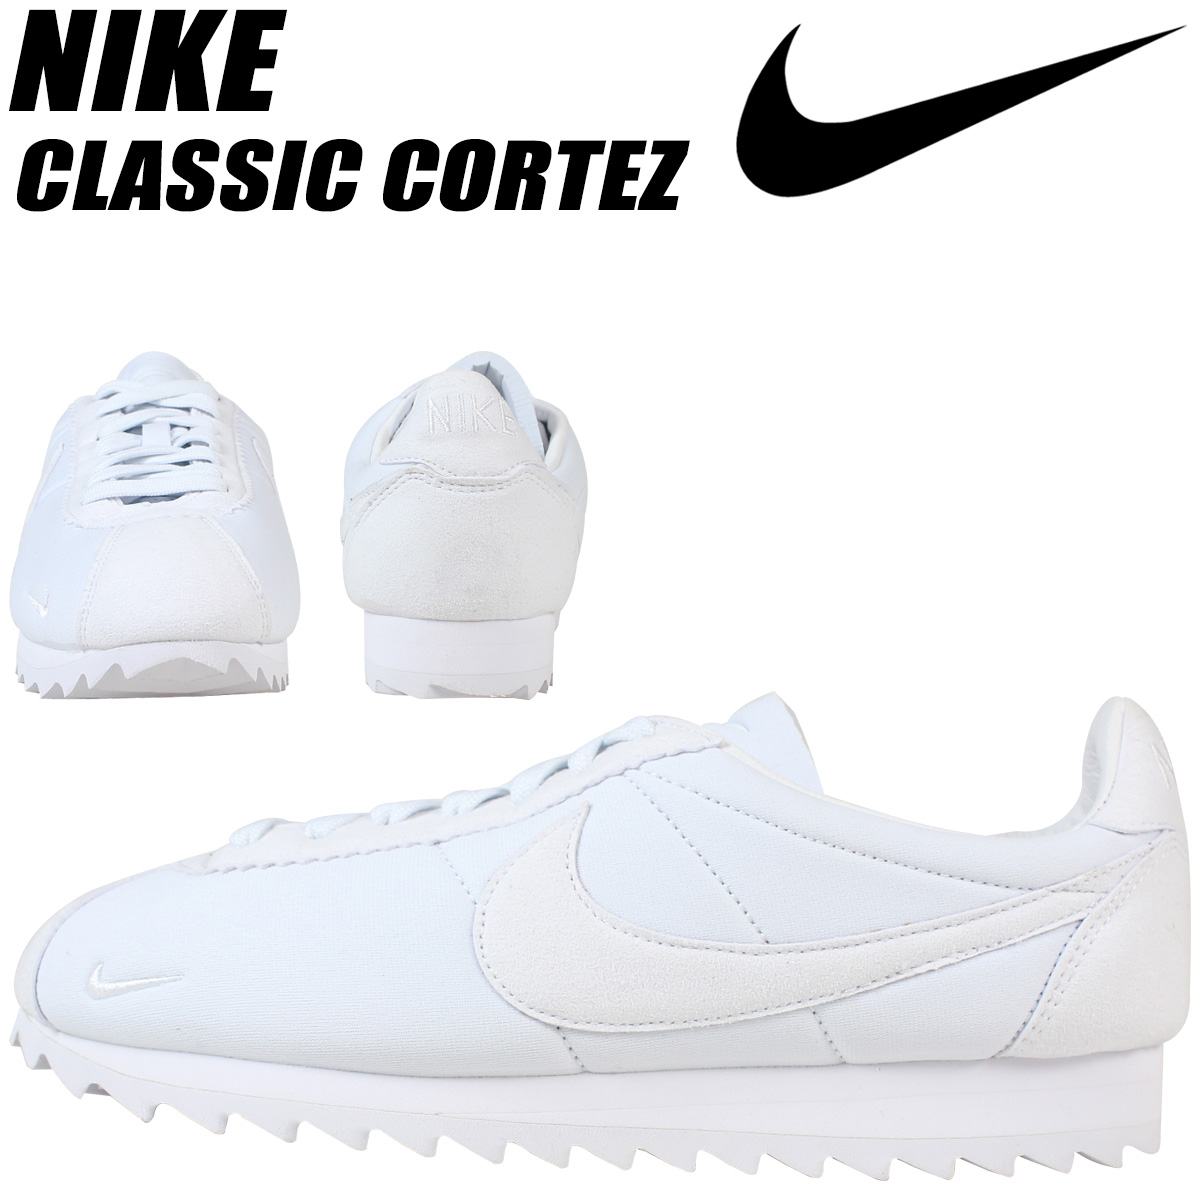 check out 5646a 5eae6 NIKE Nike classic Cortez sneaker CLASSIC CORTEZ SHARK LOW 810135-110 men's  shoes white